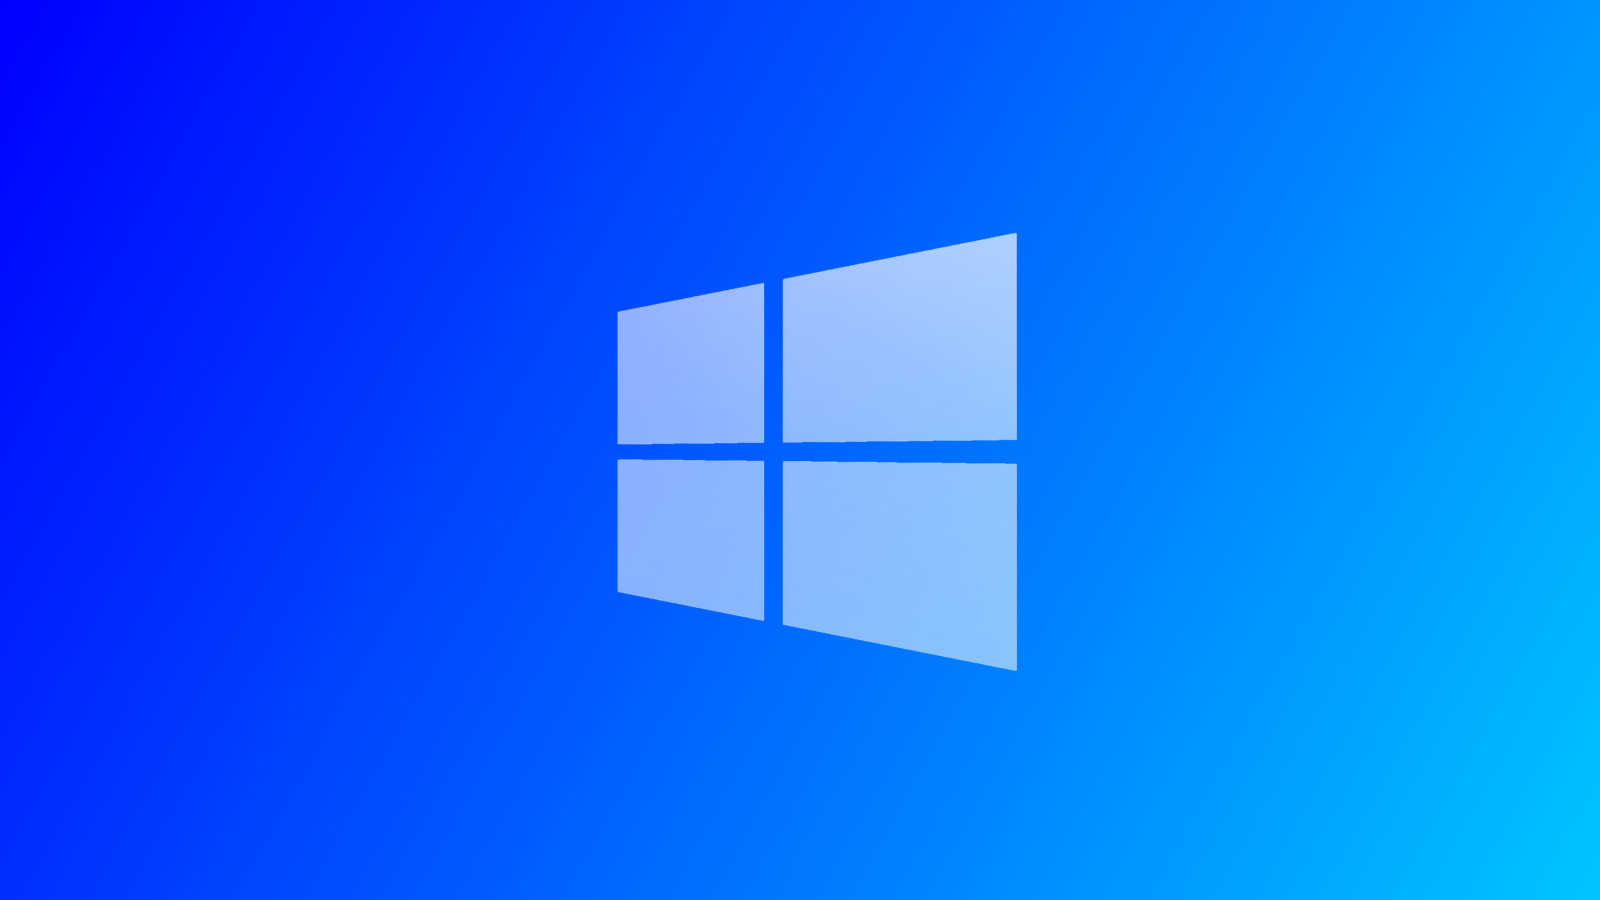 Windows 8 1 Blue Gradient Wallpaper Weasyl